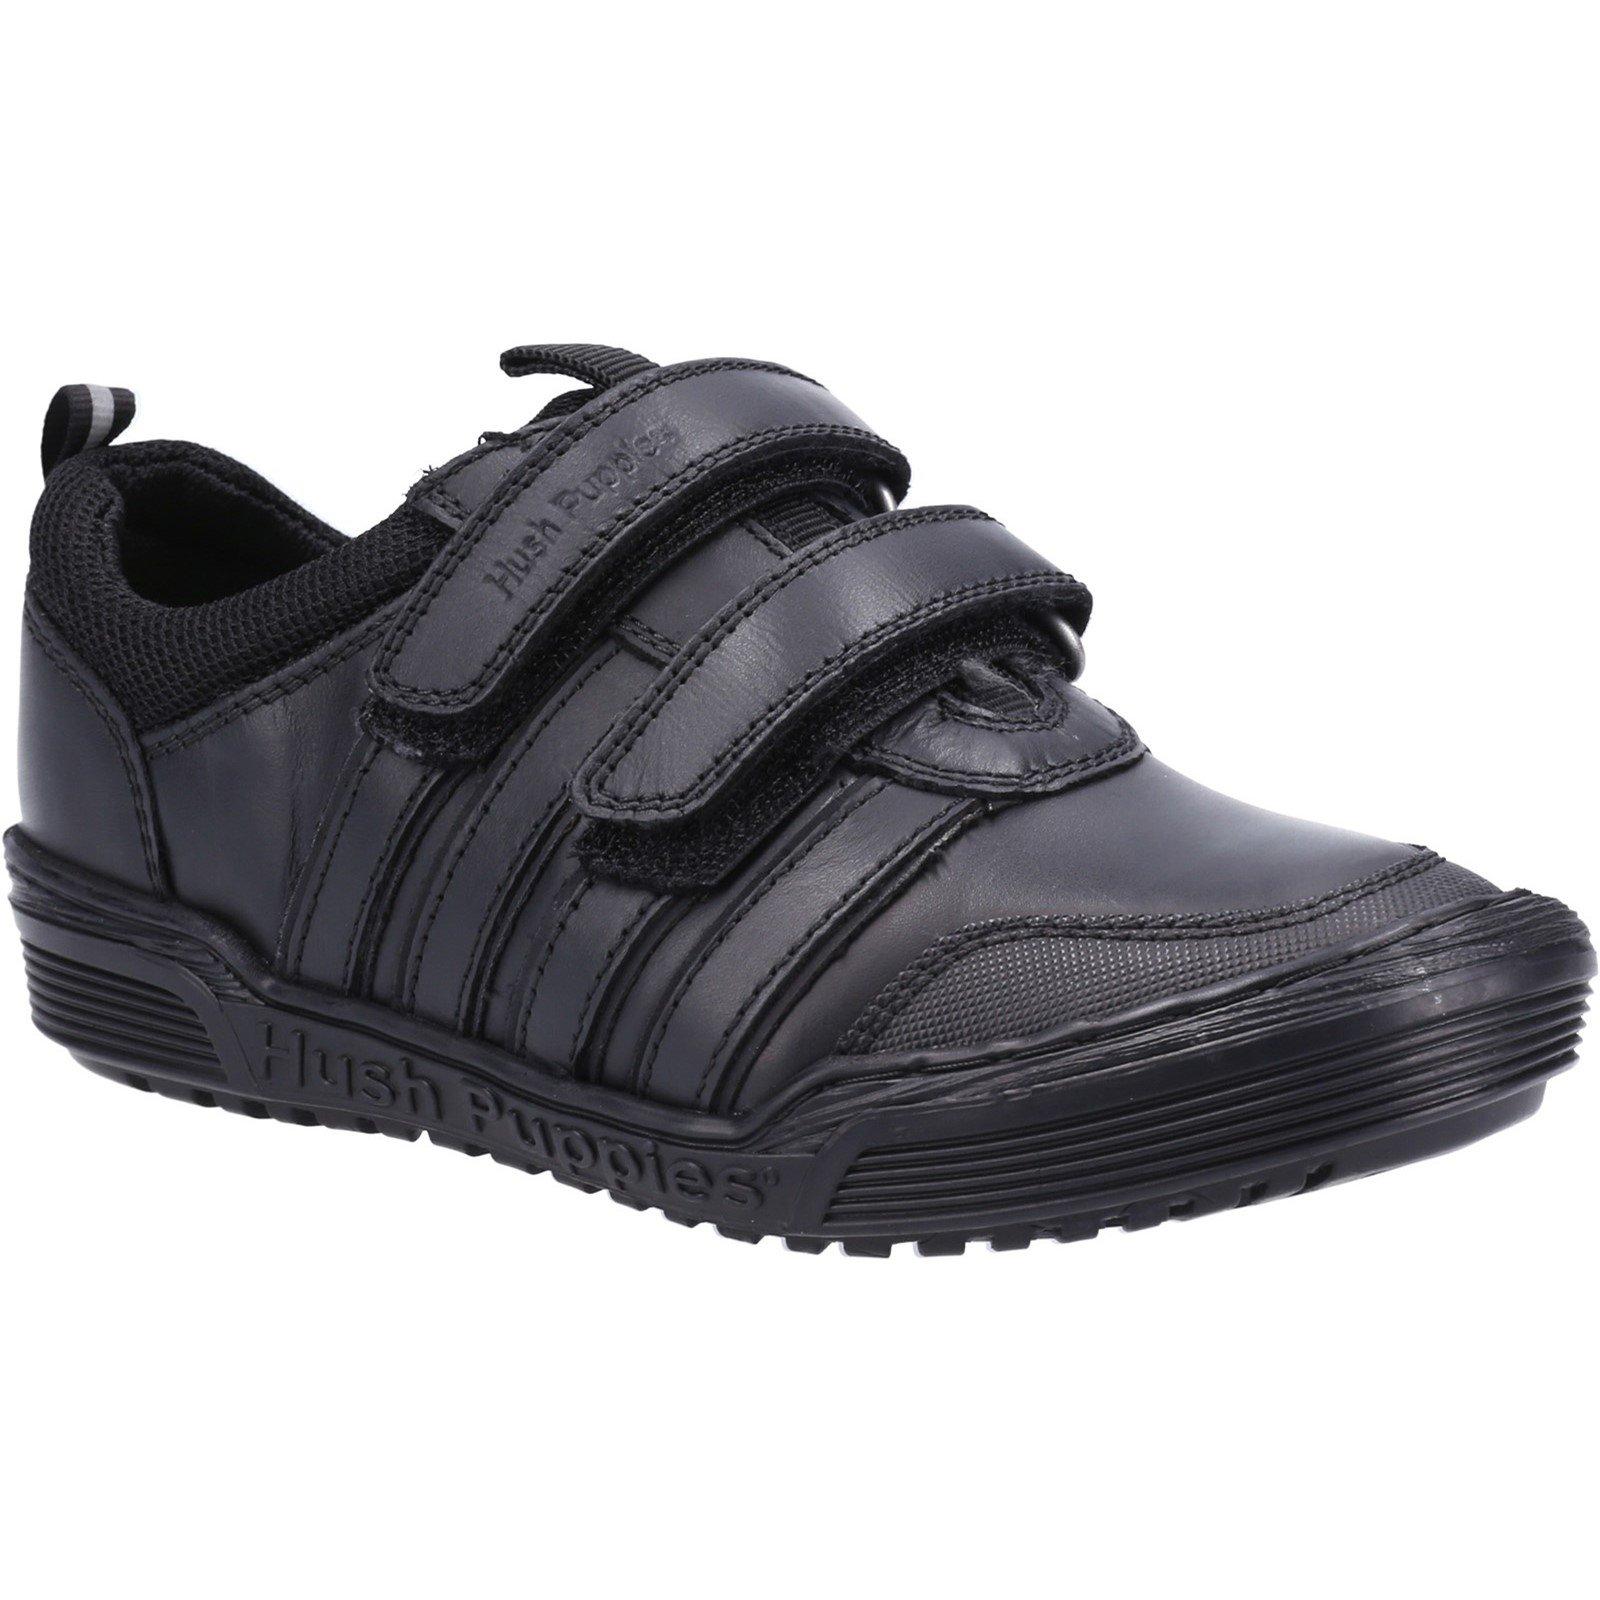 Hush Puppies Kid's Jake School Shoe Black 32736 - Black 12